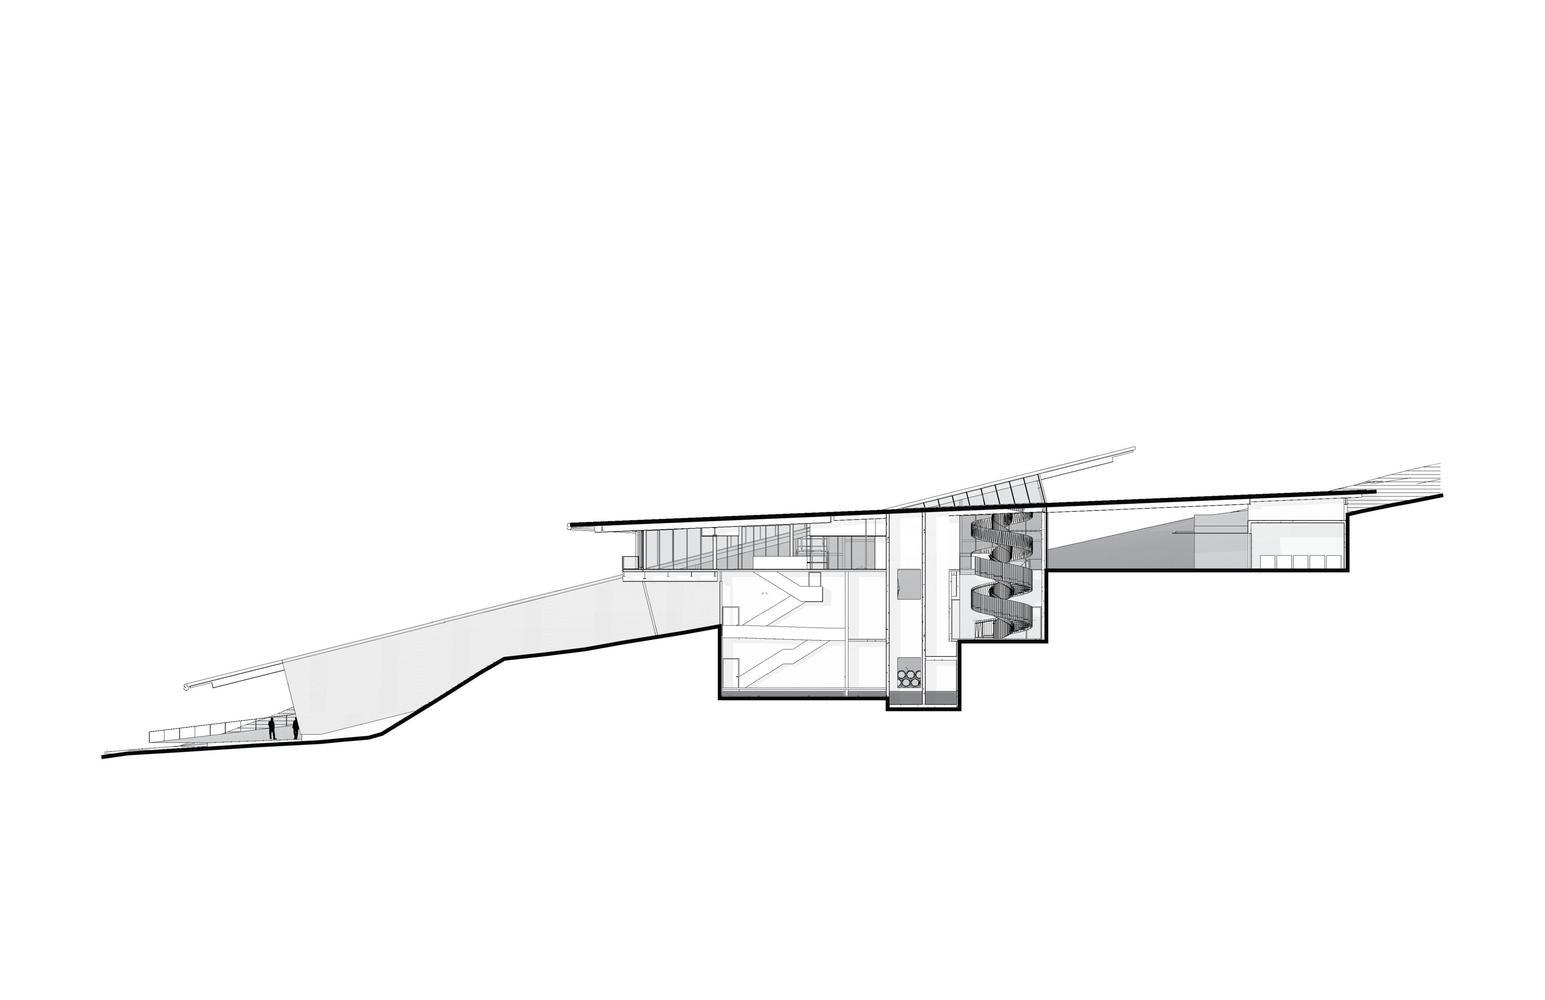 Gallery Of Martins Lane Winery Olson Kundig 57 Beam Bridge Diagram Winerysection 02